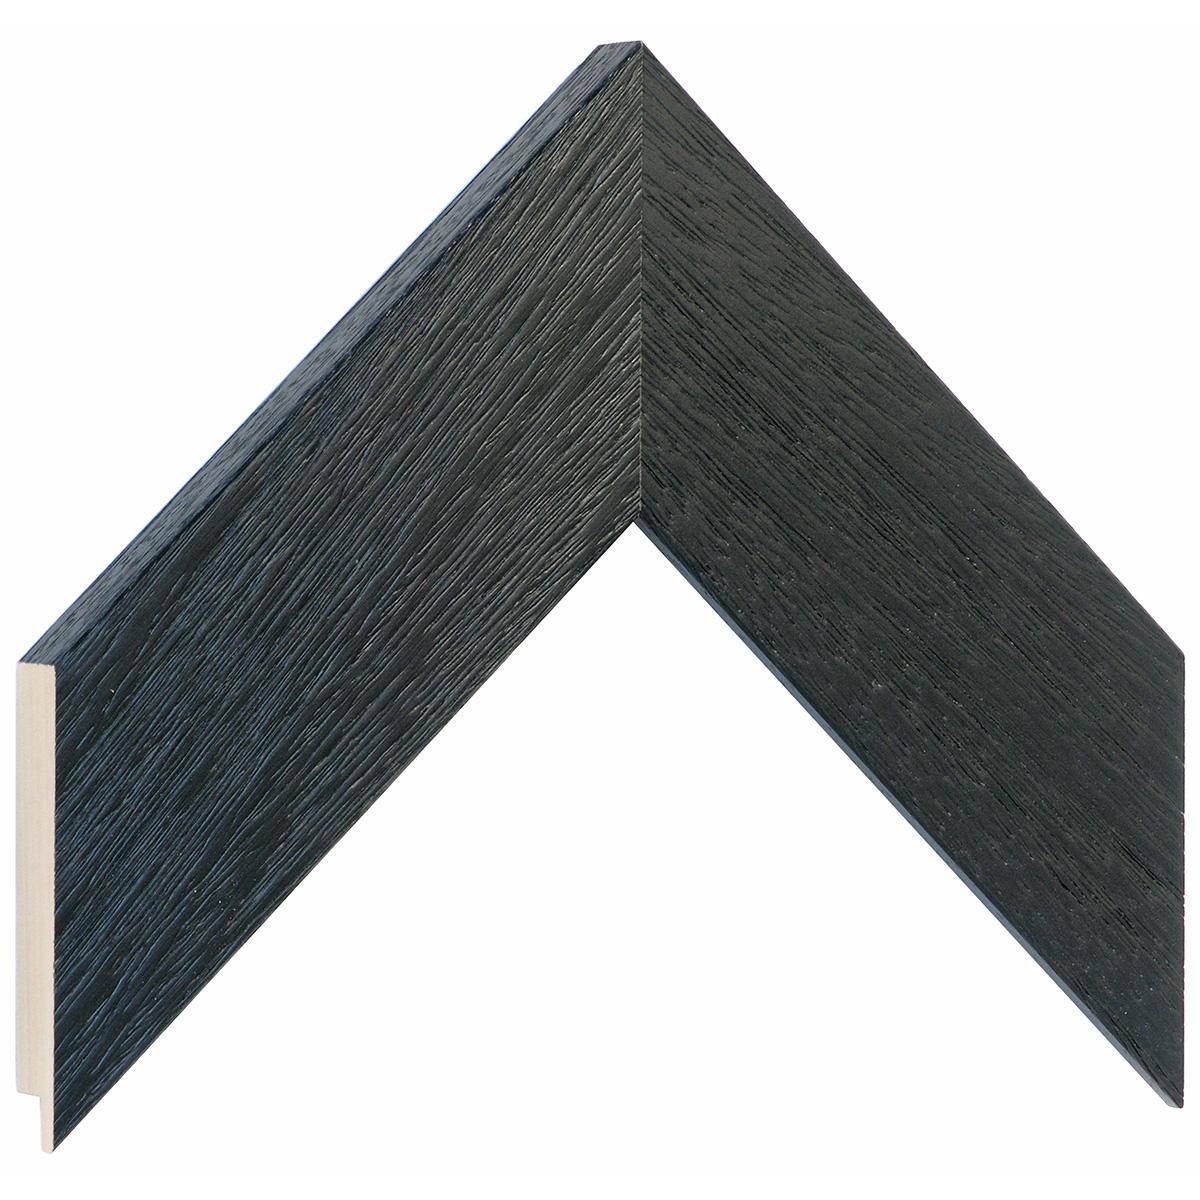 Moulding ayous, width 58mm height 20 - black, open grain